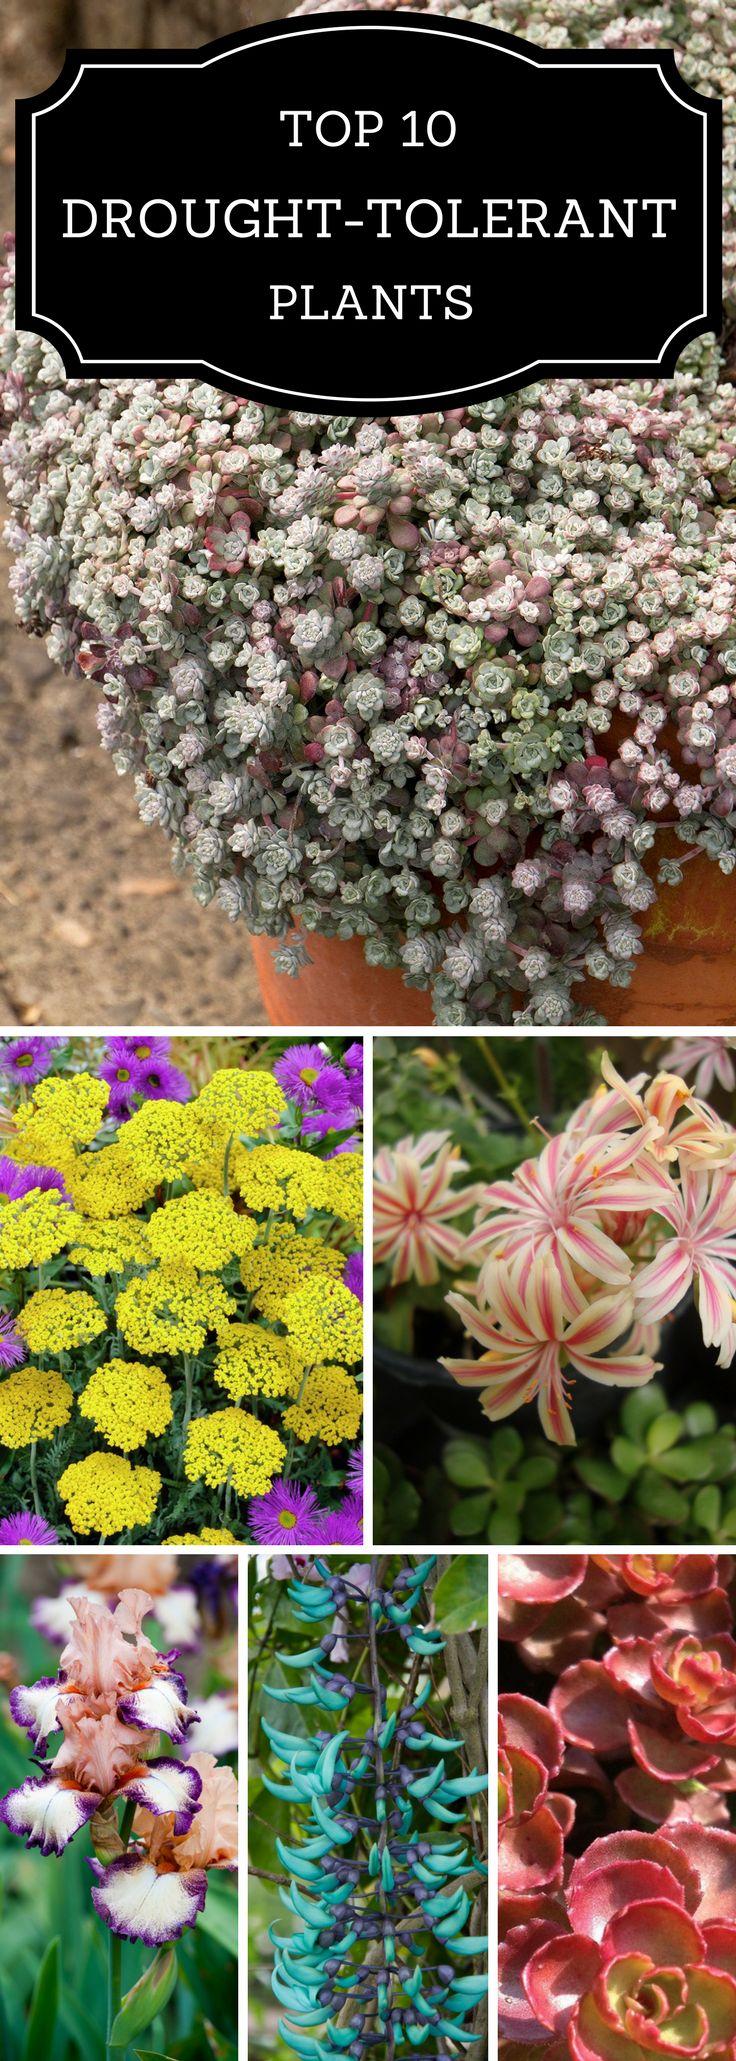 Top 10 Drought - Tolerant Plants